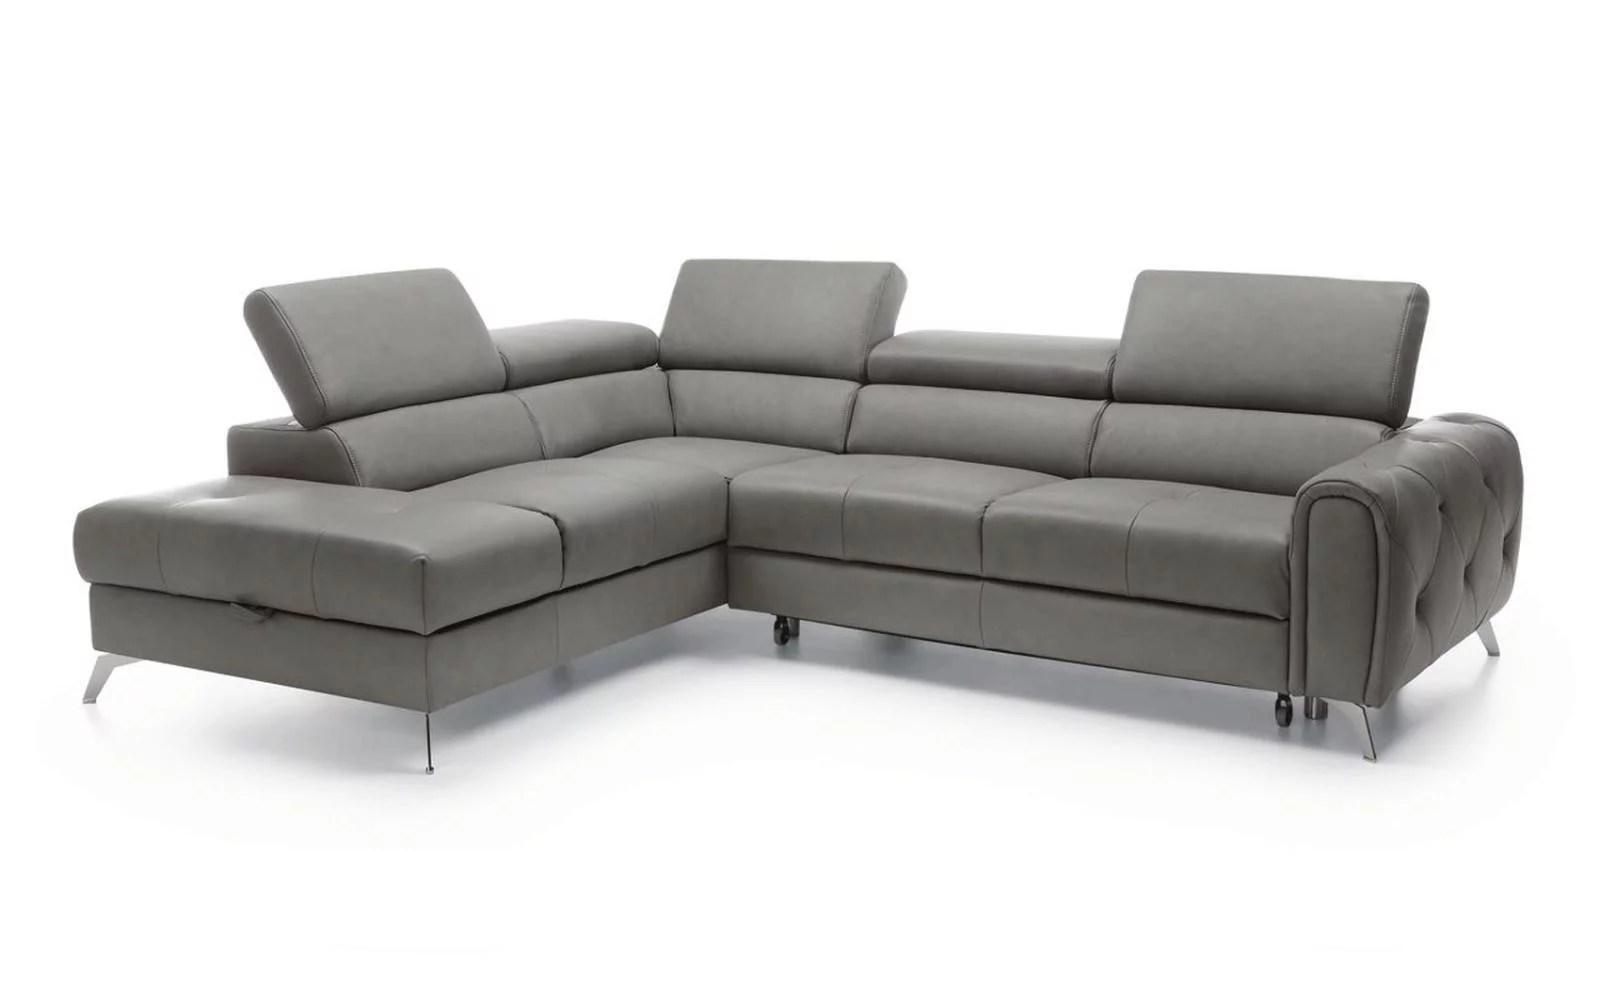 grey italian genuine leather sectional sofa bed storage modern left soflex camelia